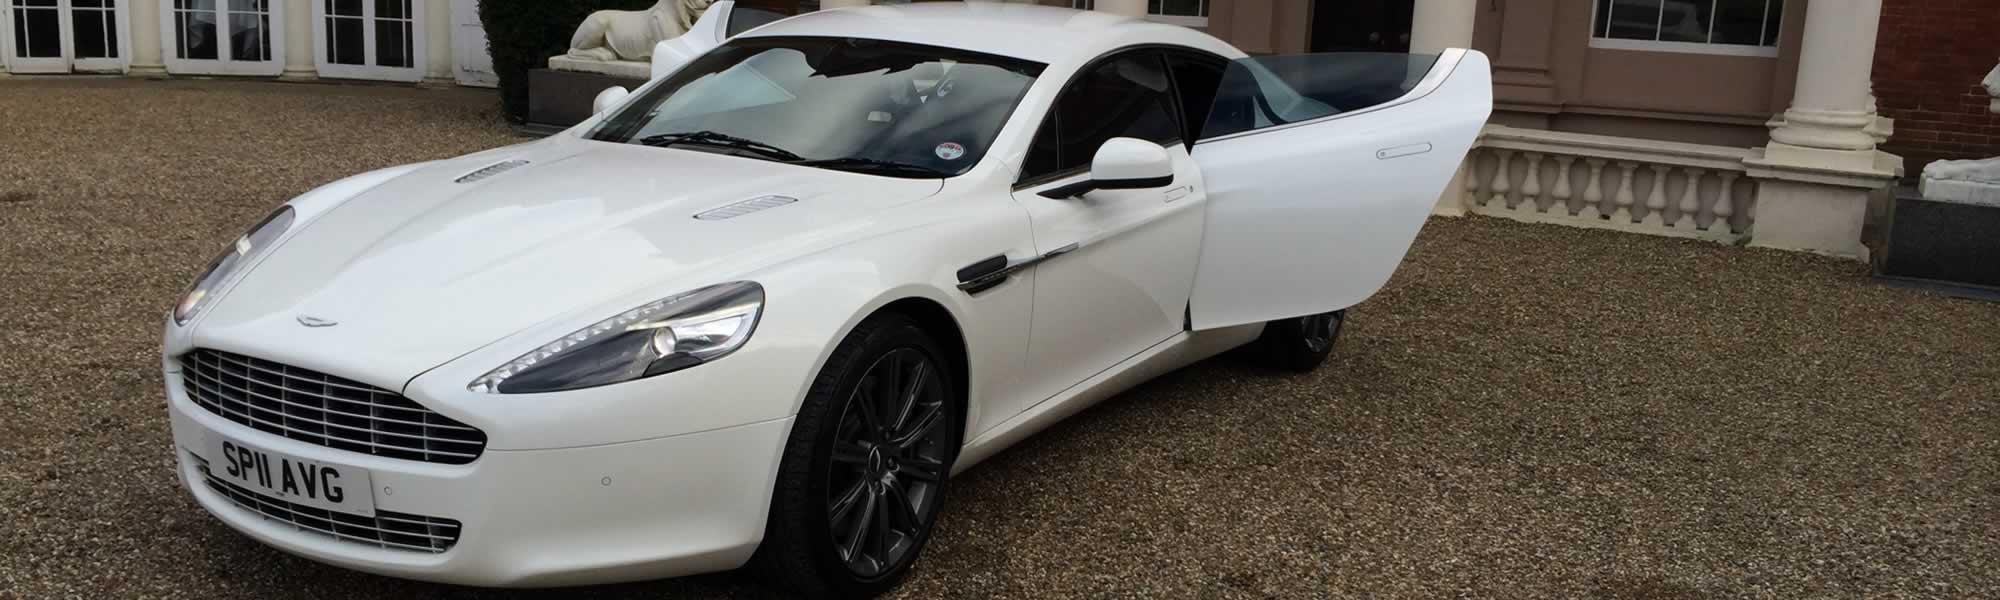 Aston Martin hire London